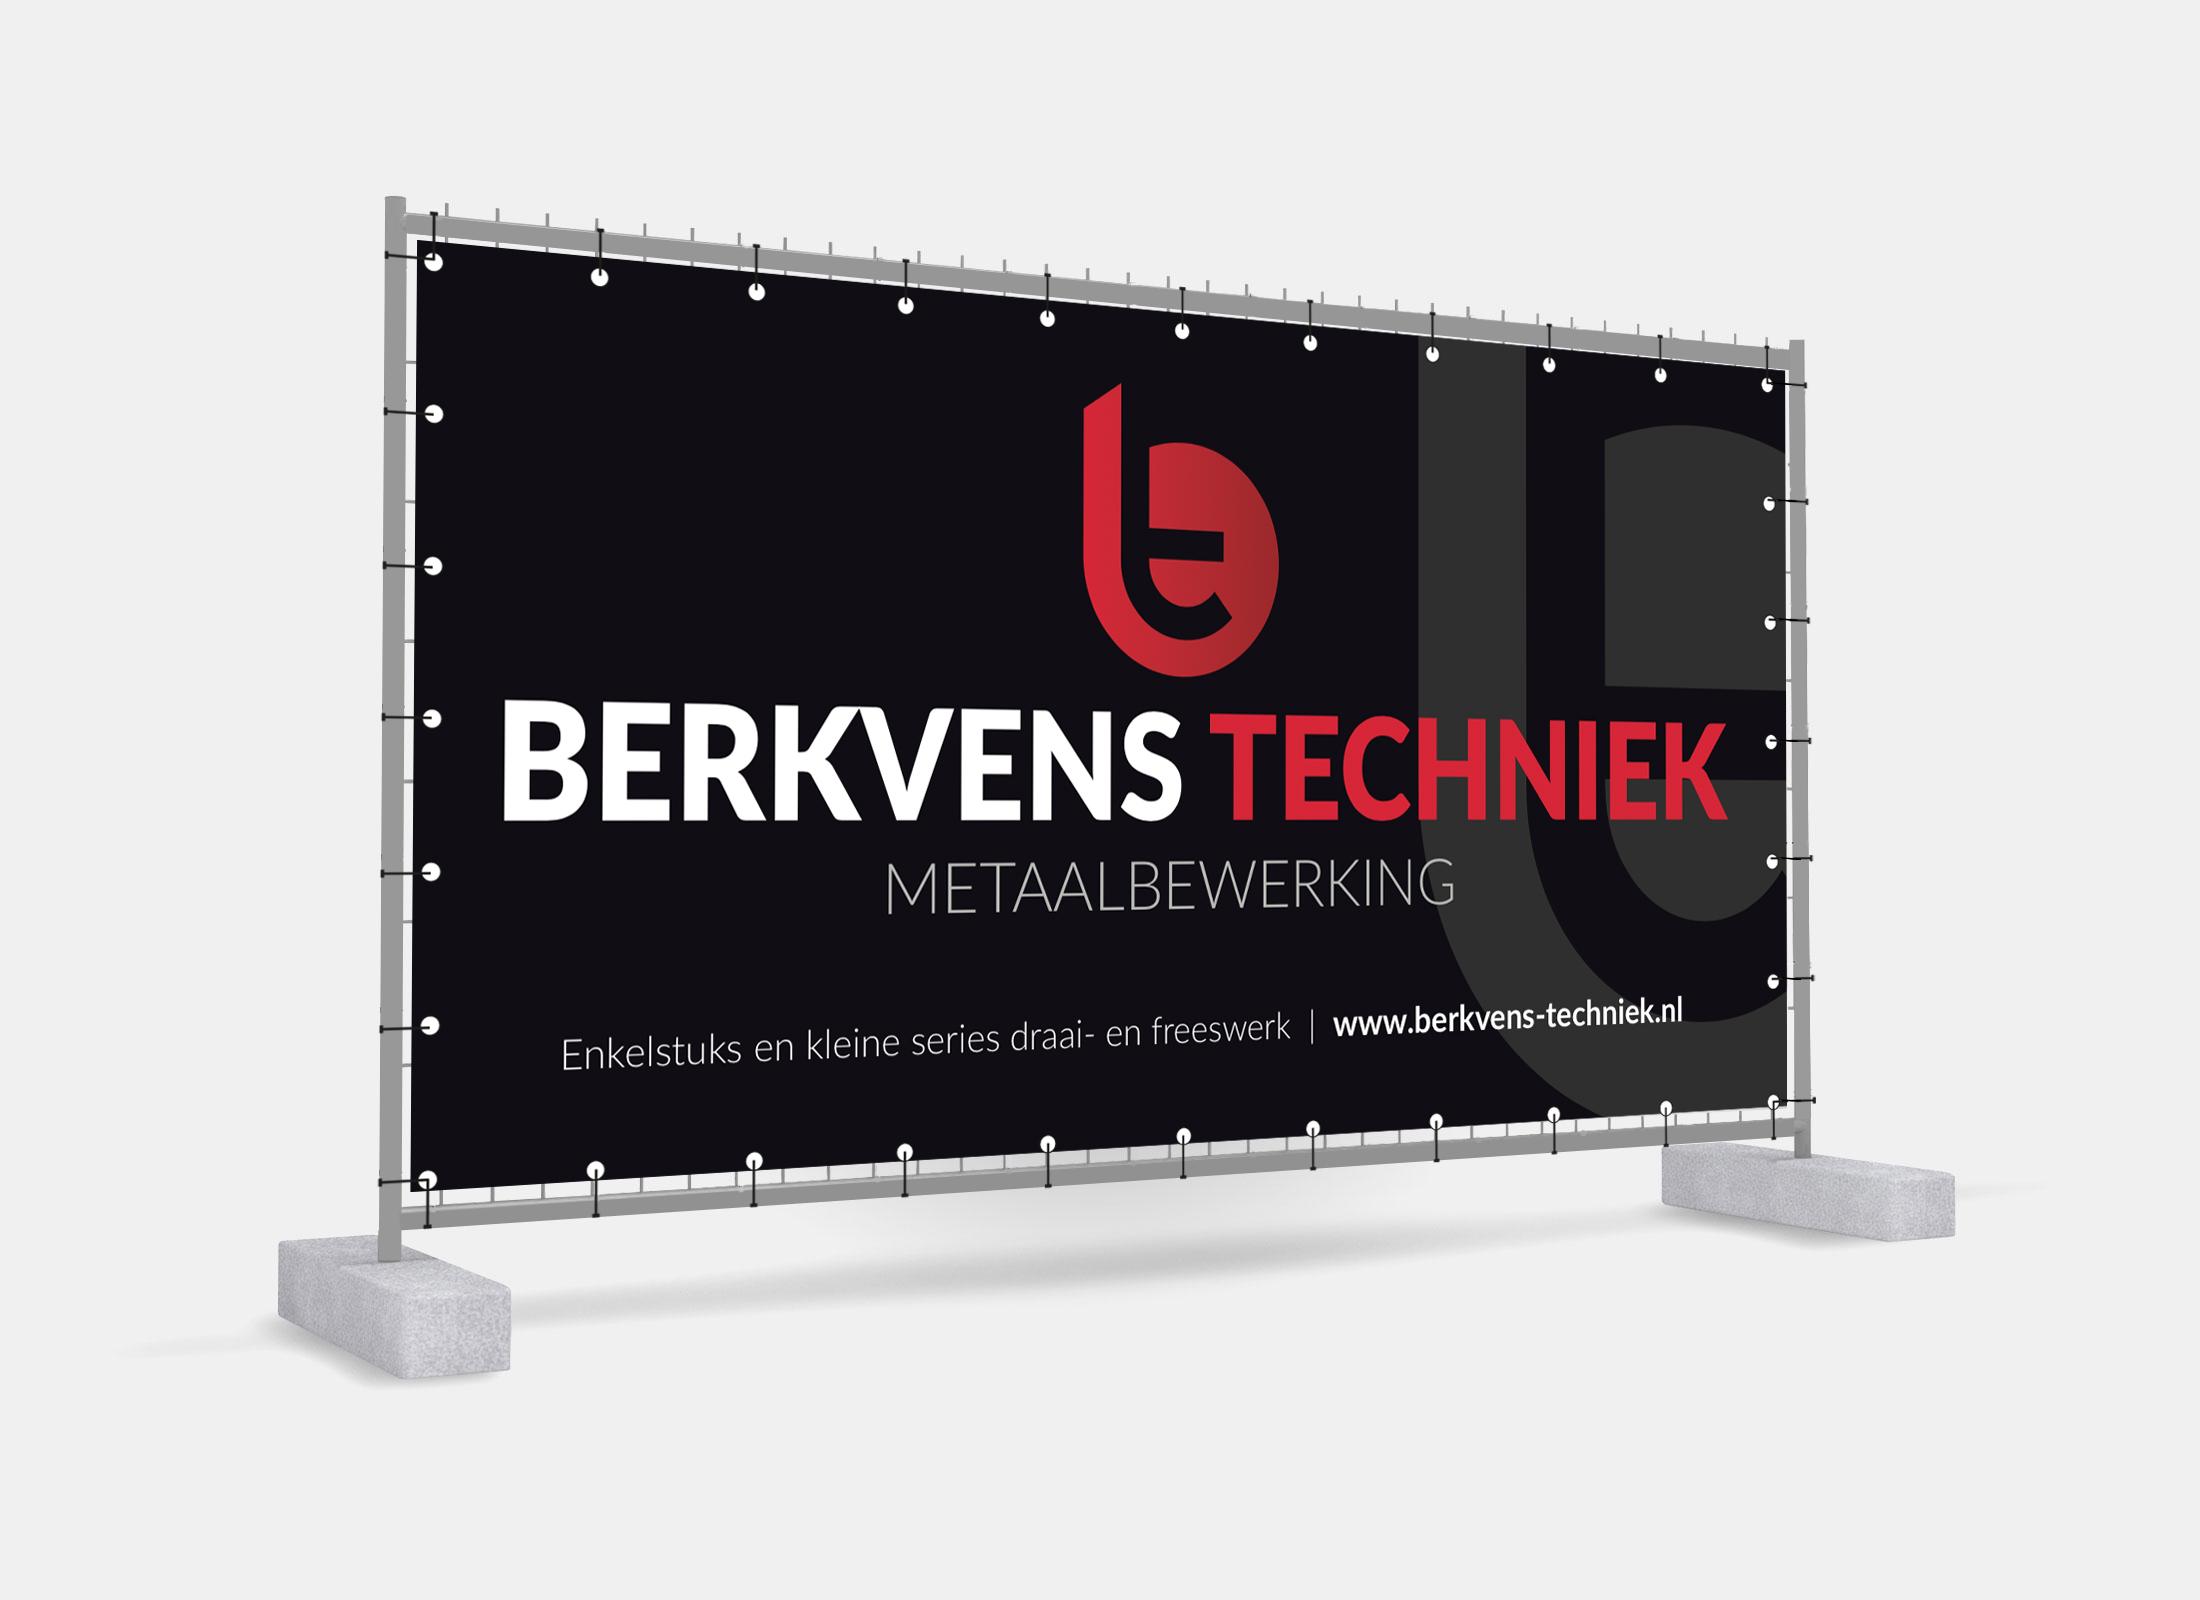 bouwhek-banners-berkvens-techniek-asten